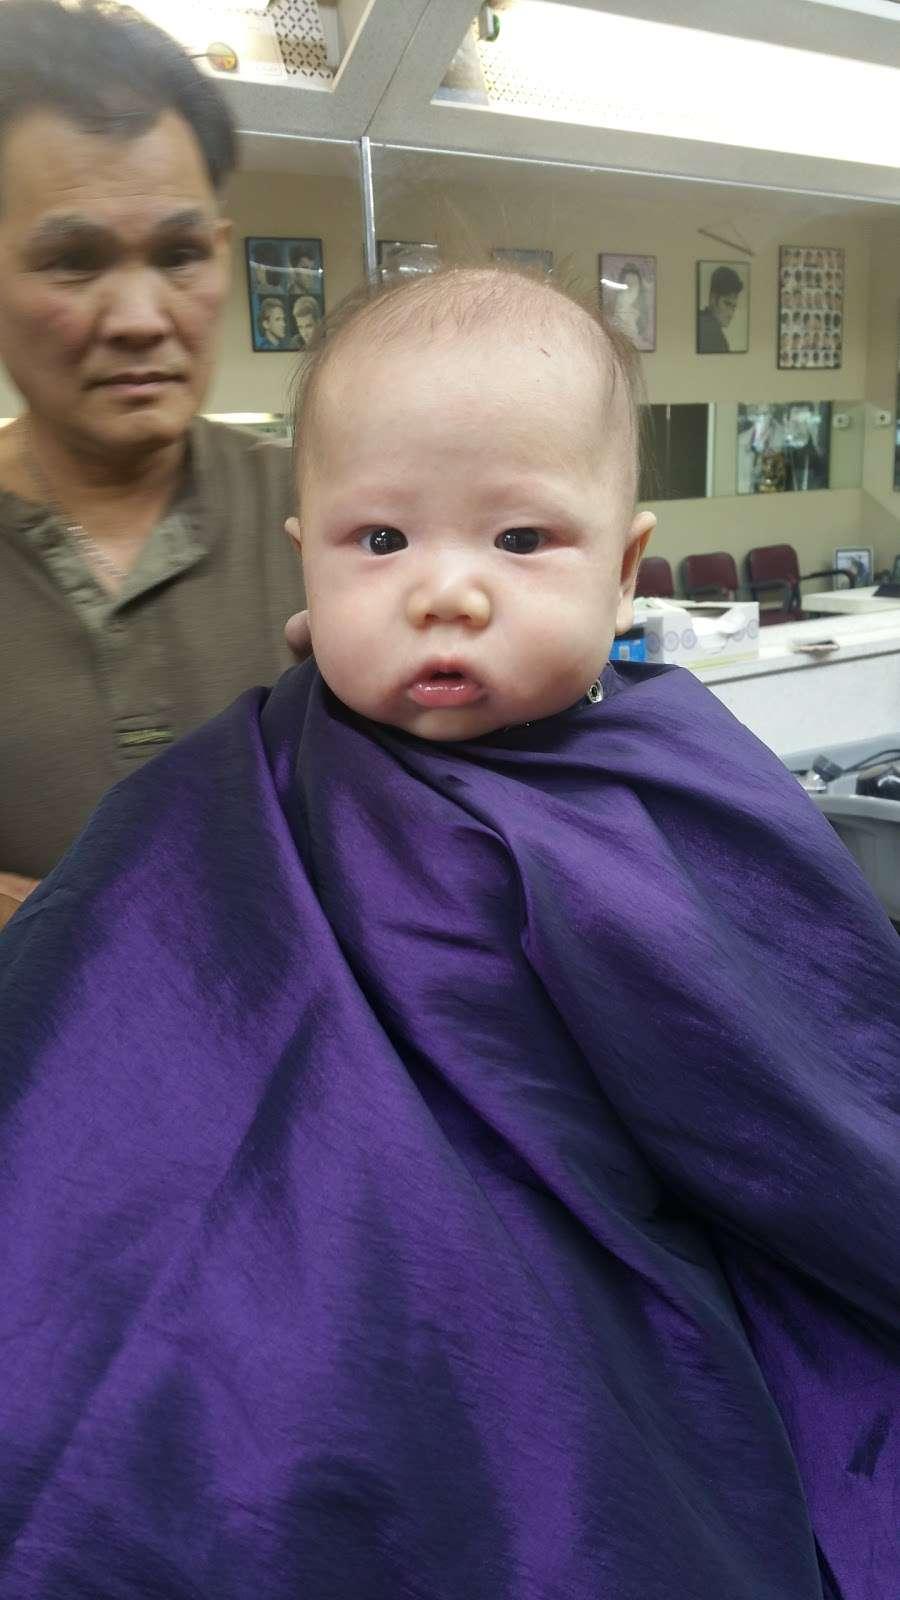 Toms Barber - hair care  | Photo 10 of 10 | Address: 6031 Wilson Blvd, Arlington, VA 22205, USA | Phone: (703) 241-1335